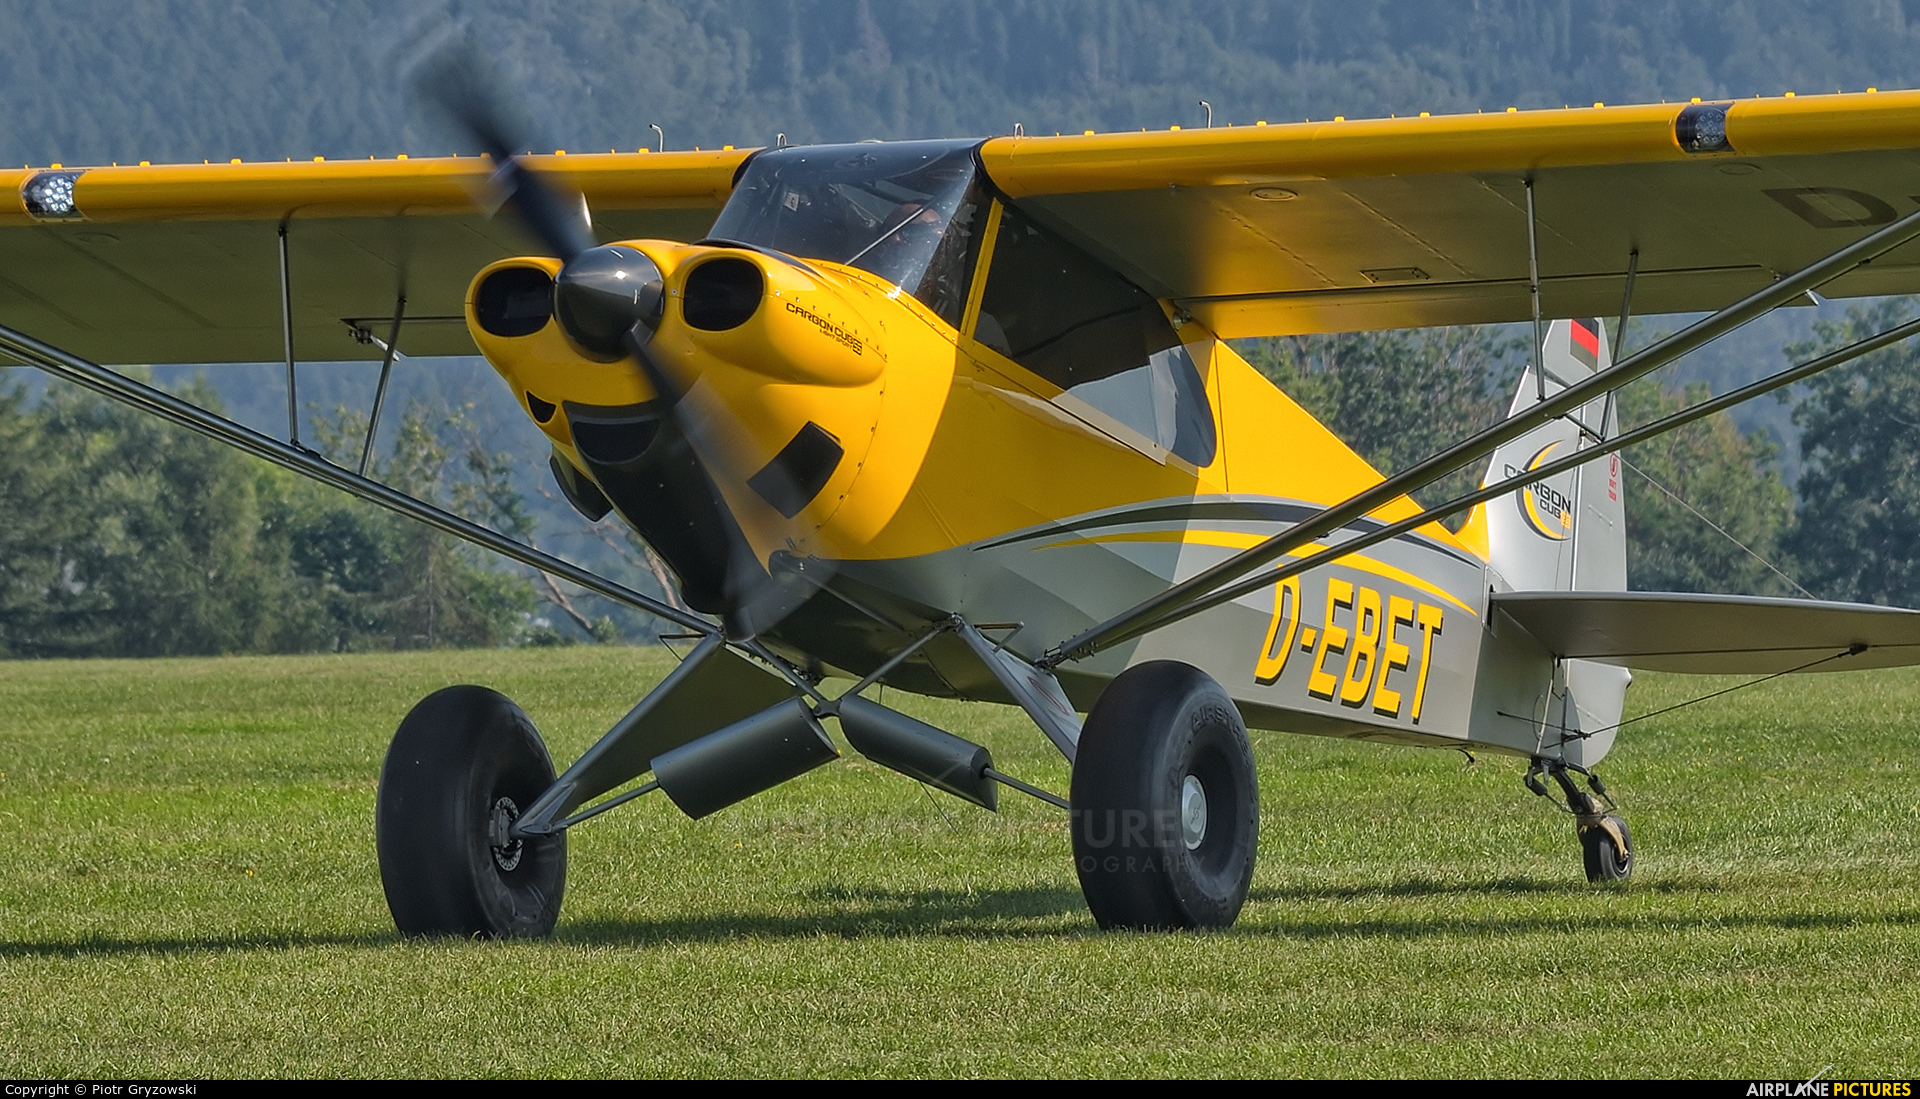 Private D-EBET aircraft at Bielsko-Biała - Aleksandrowice